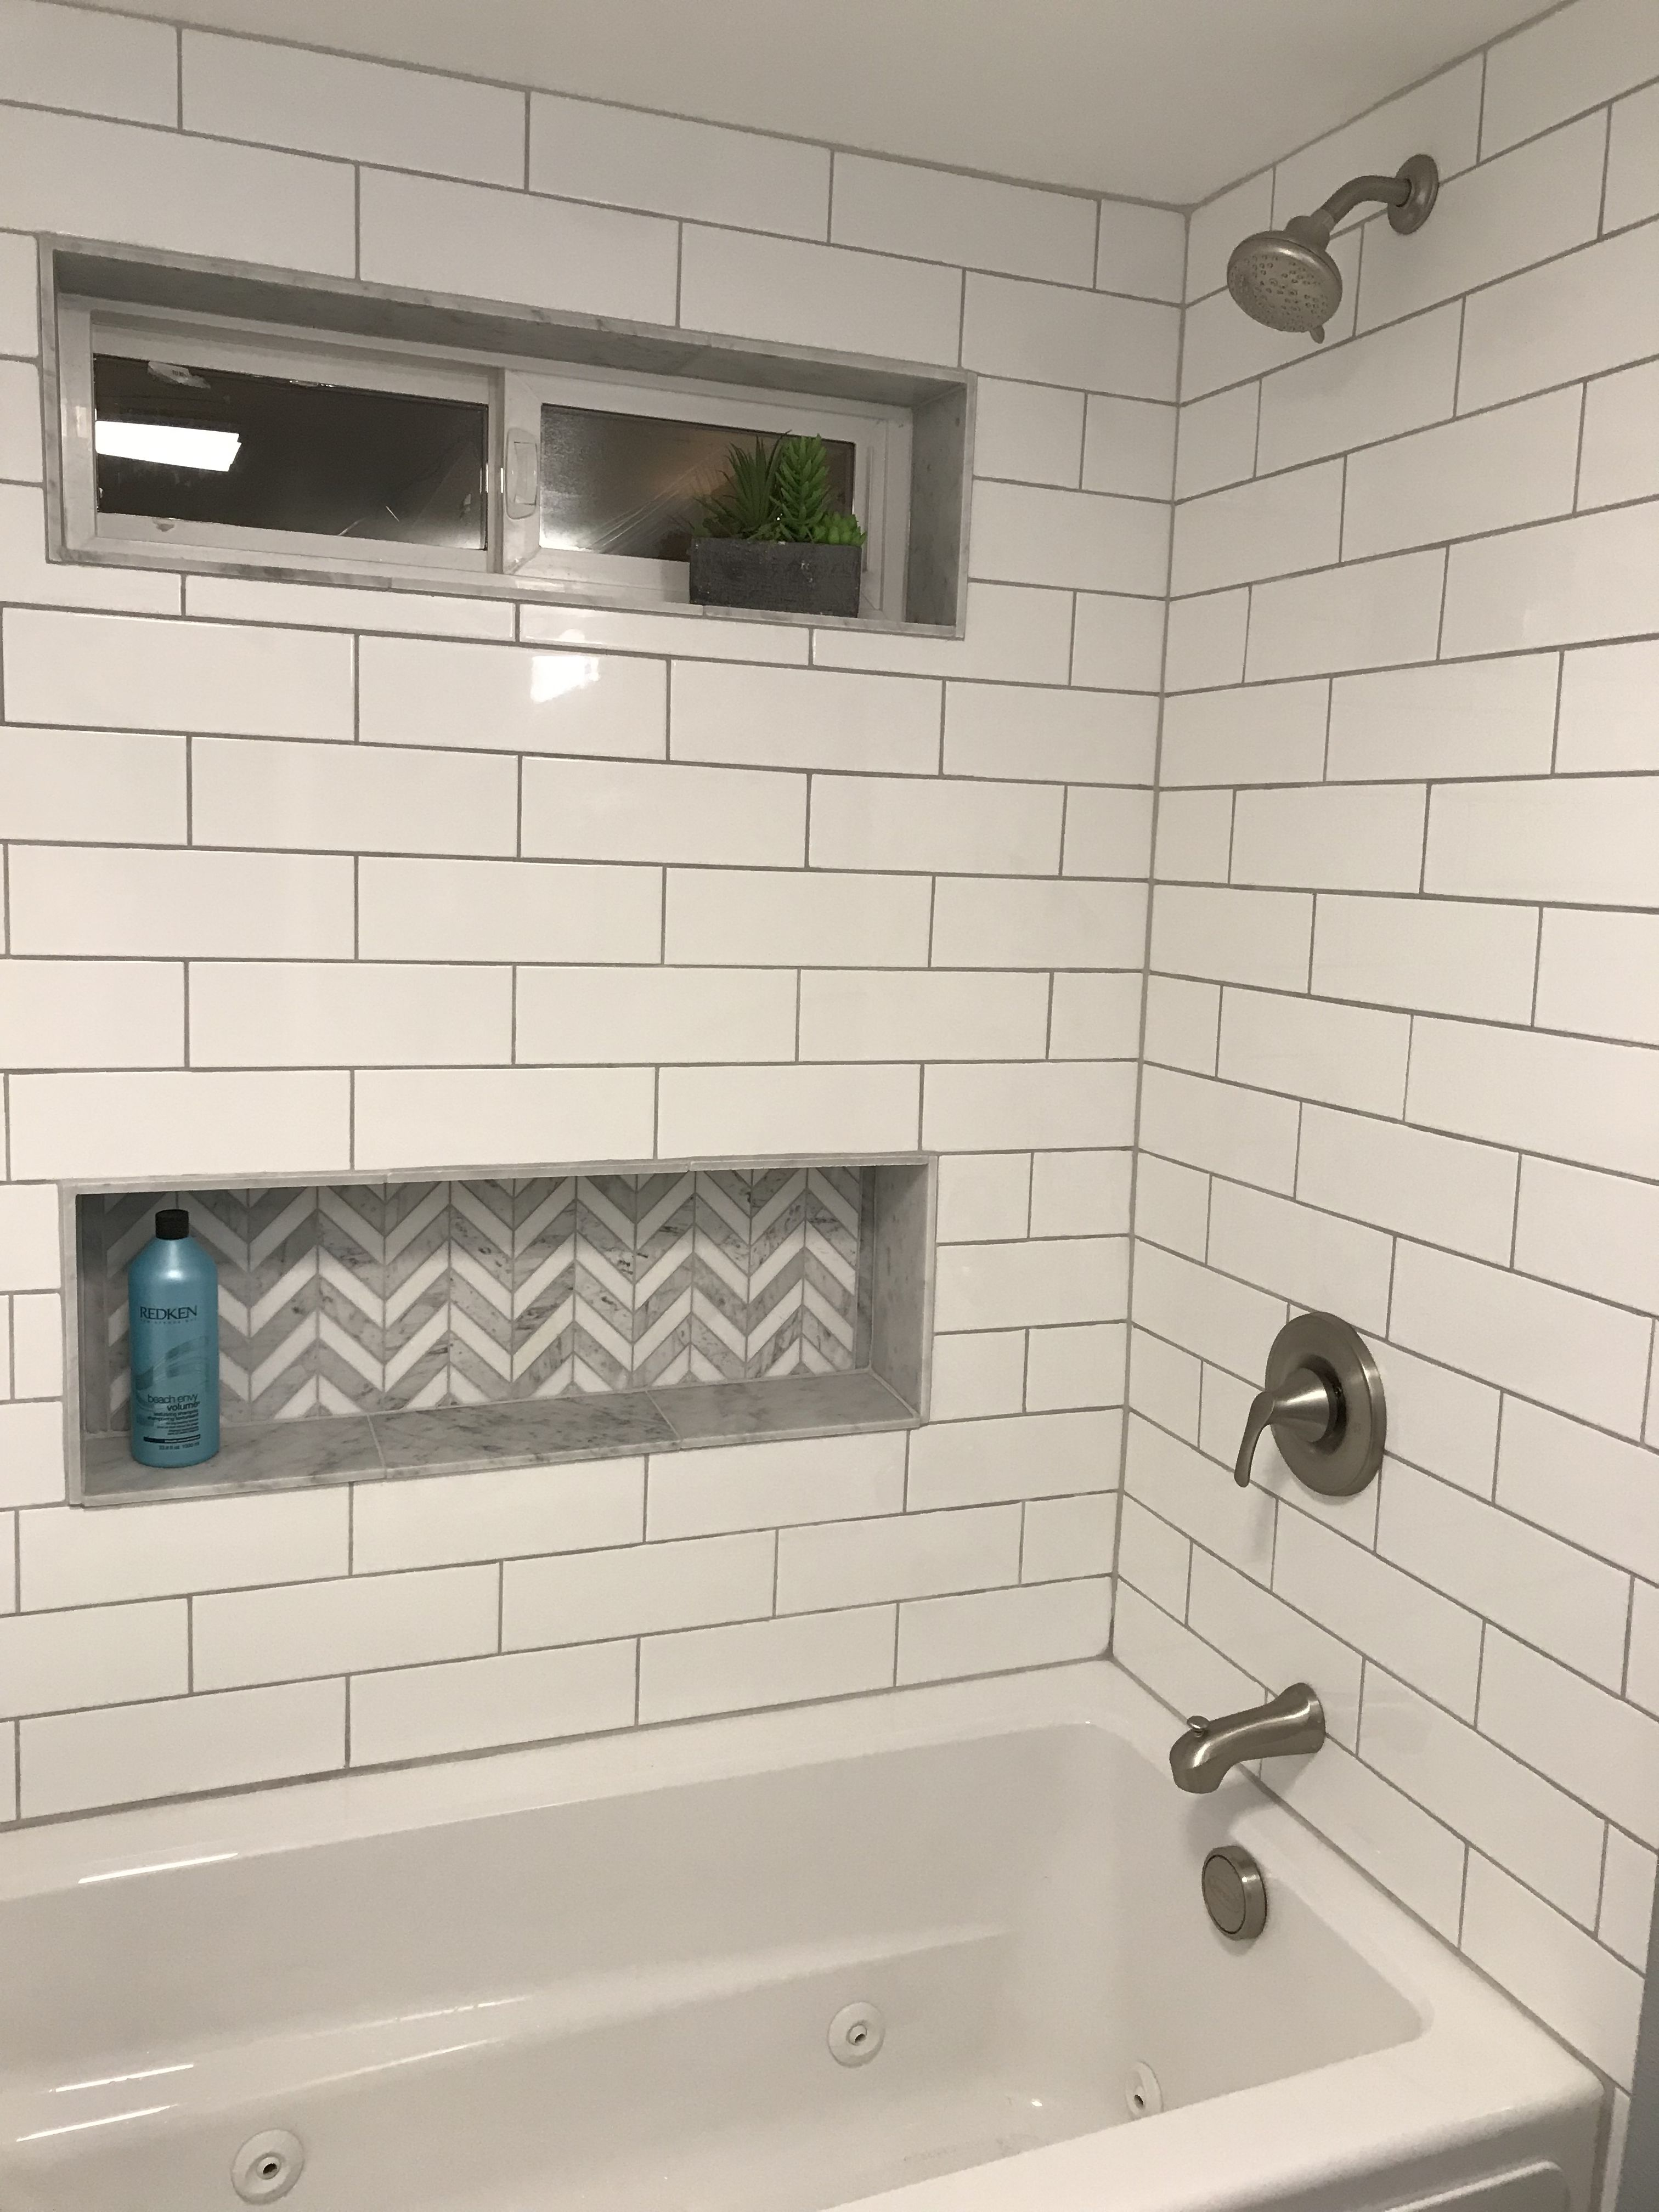 Bathroom Remodel Subway Tile Herringbone Shower Herringbone Tile Niche Herringbone Tile Inset Chevron T Shower Shelves Bathrooms Remodel Bathroom Makeover